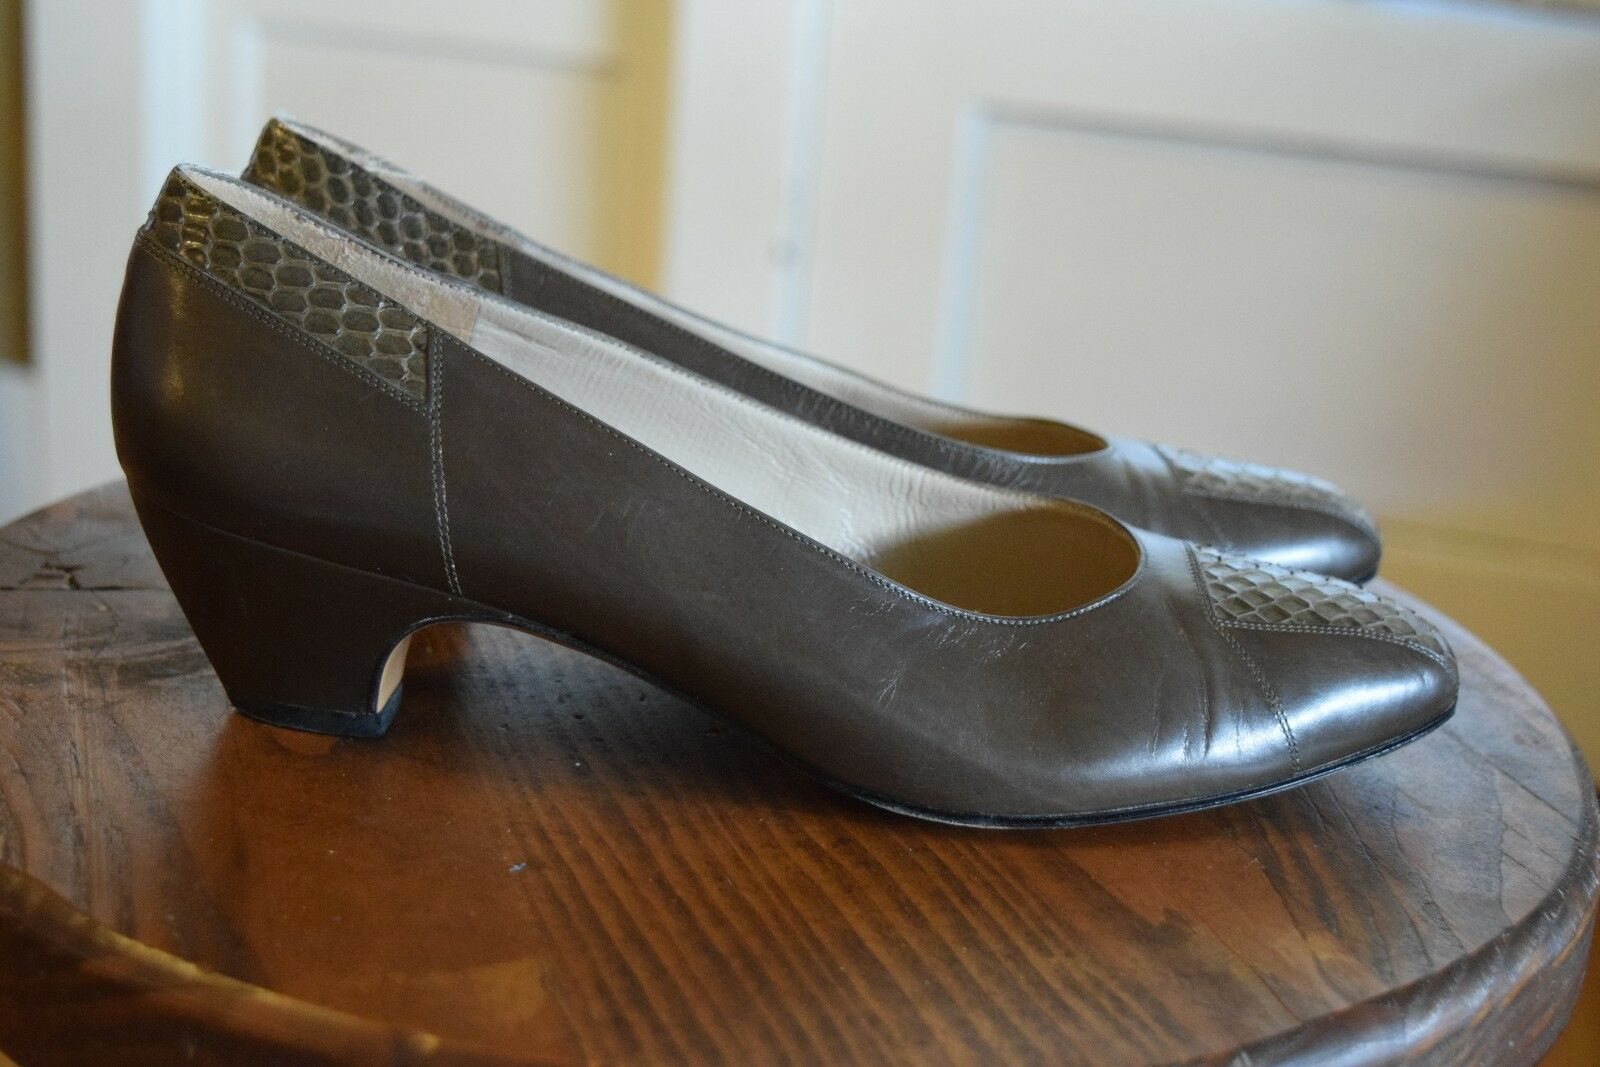 Vintage Salvatore Ferragamo Brown Snakeskin Heels Pumps shoes Women's 8B